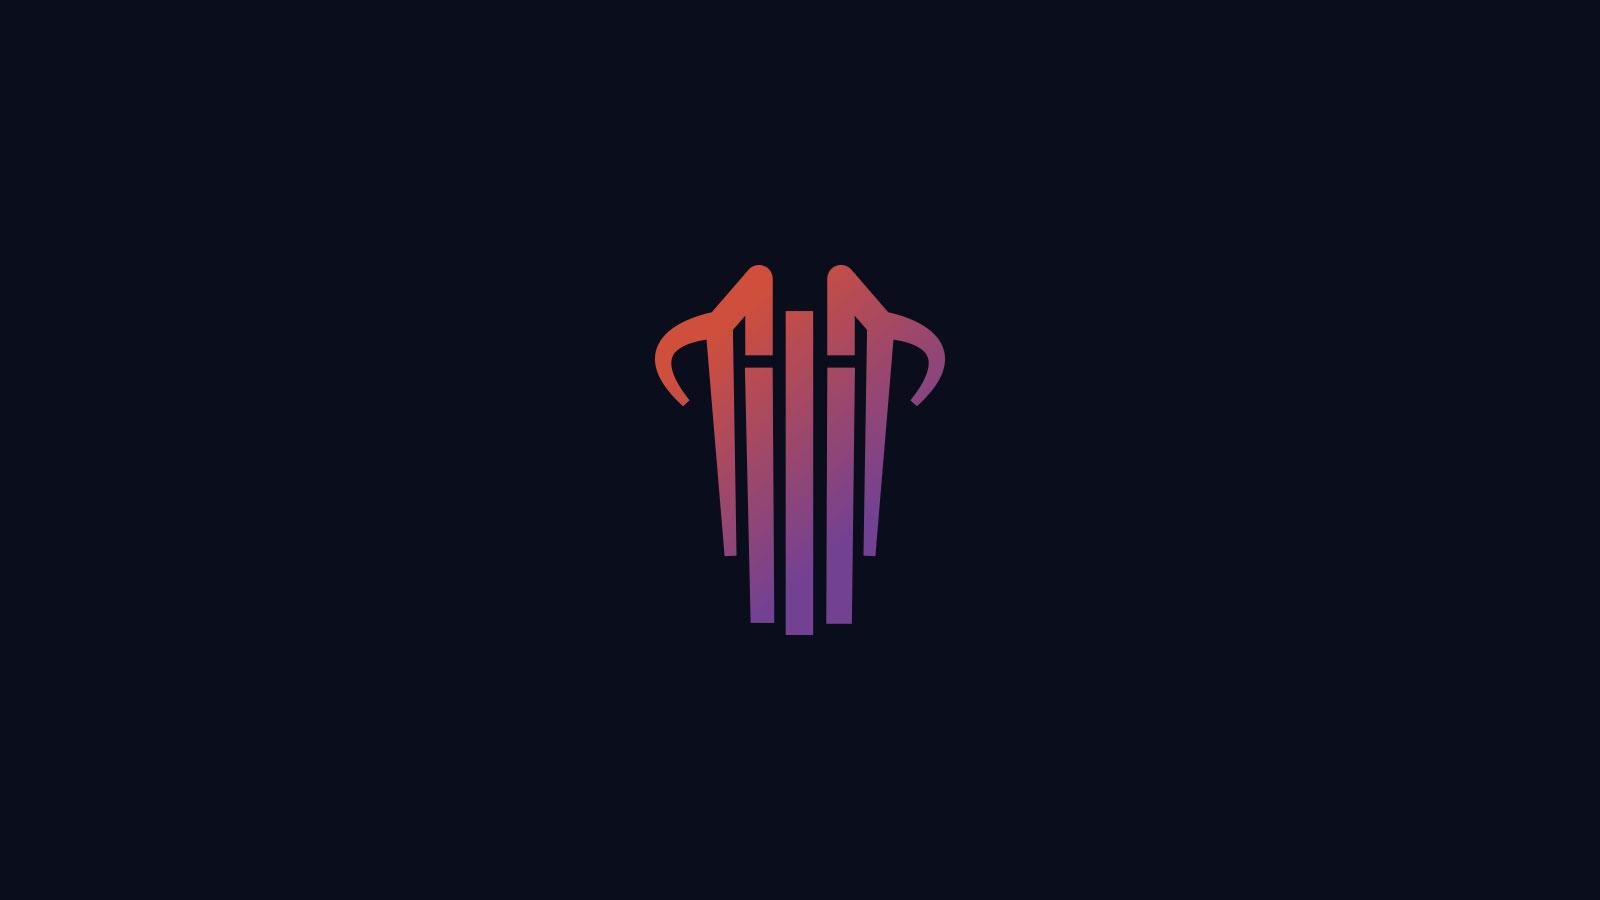 Logo design inspired by Atari עיצוב לוגו בהשראת אטארי